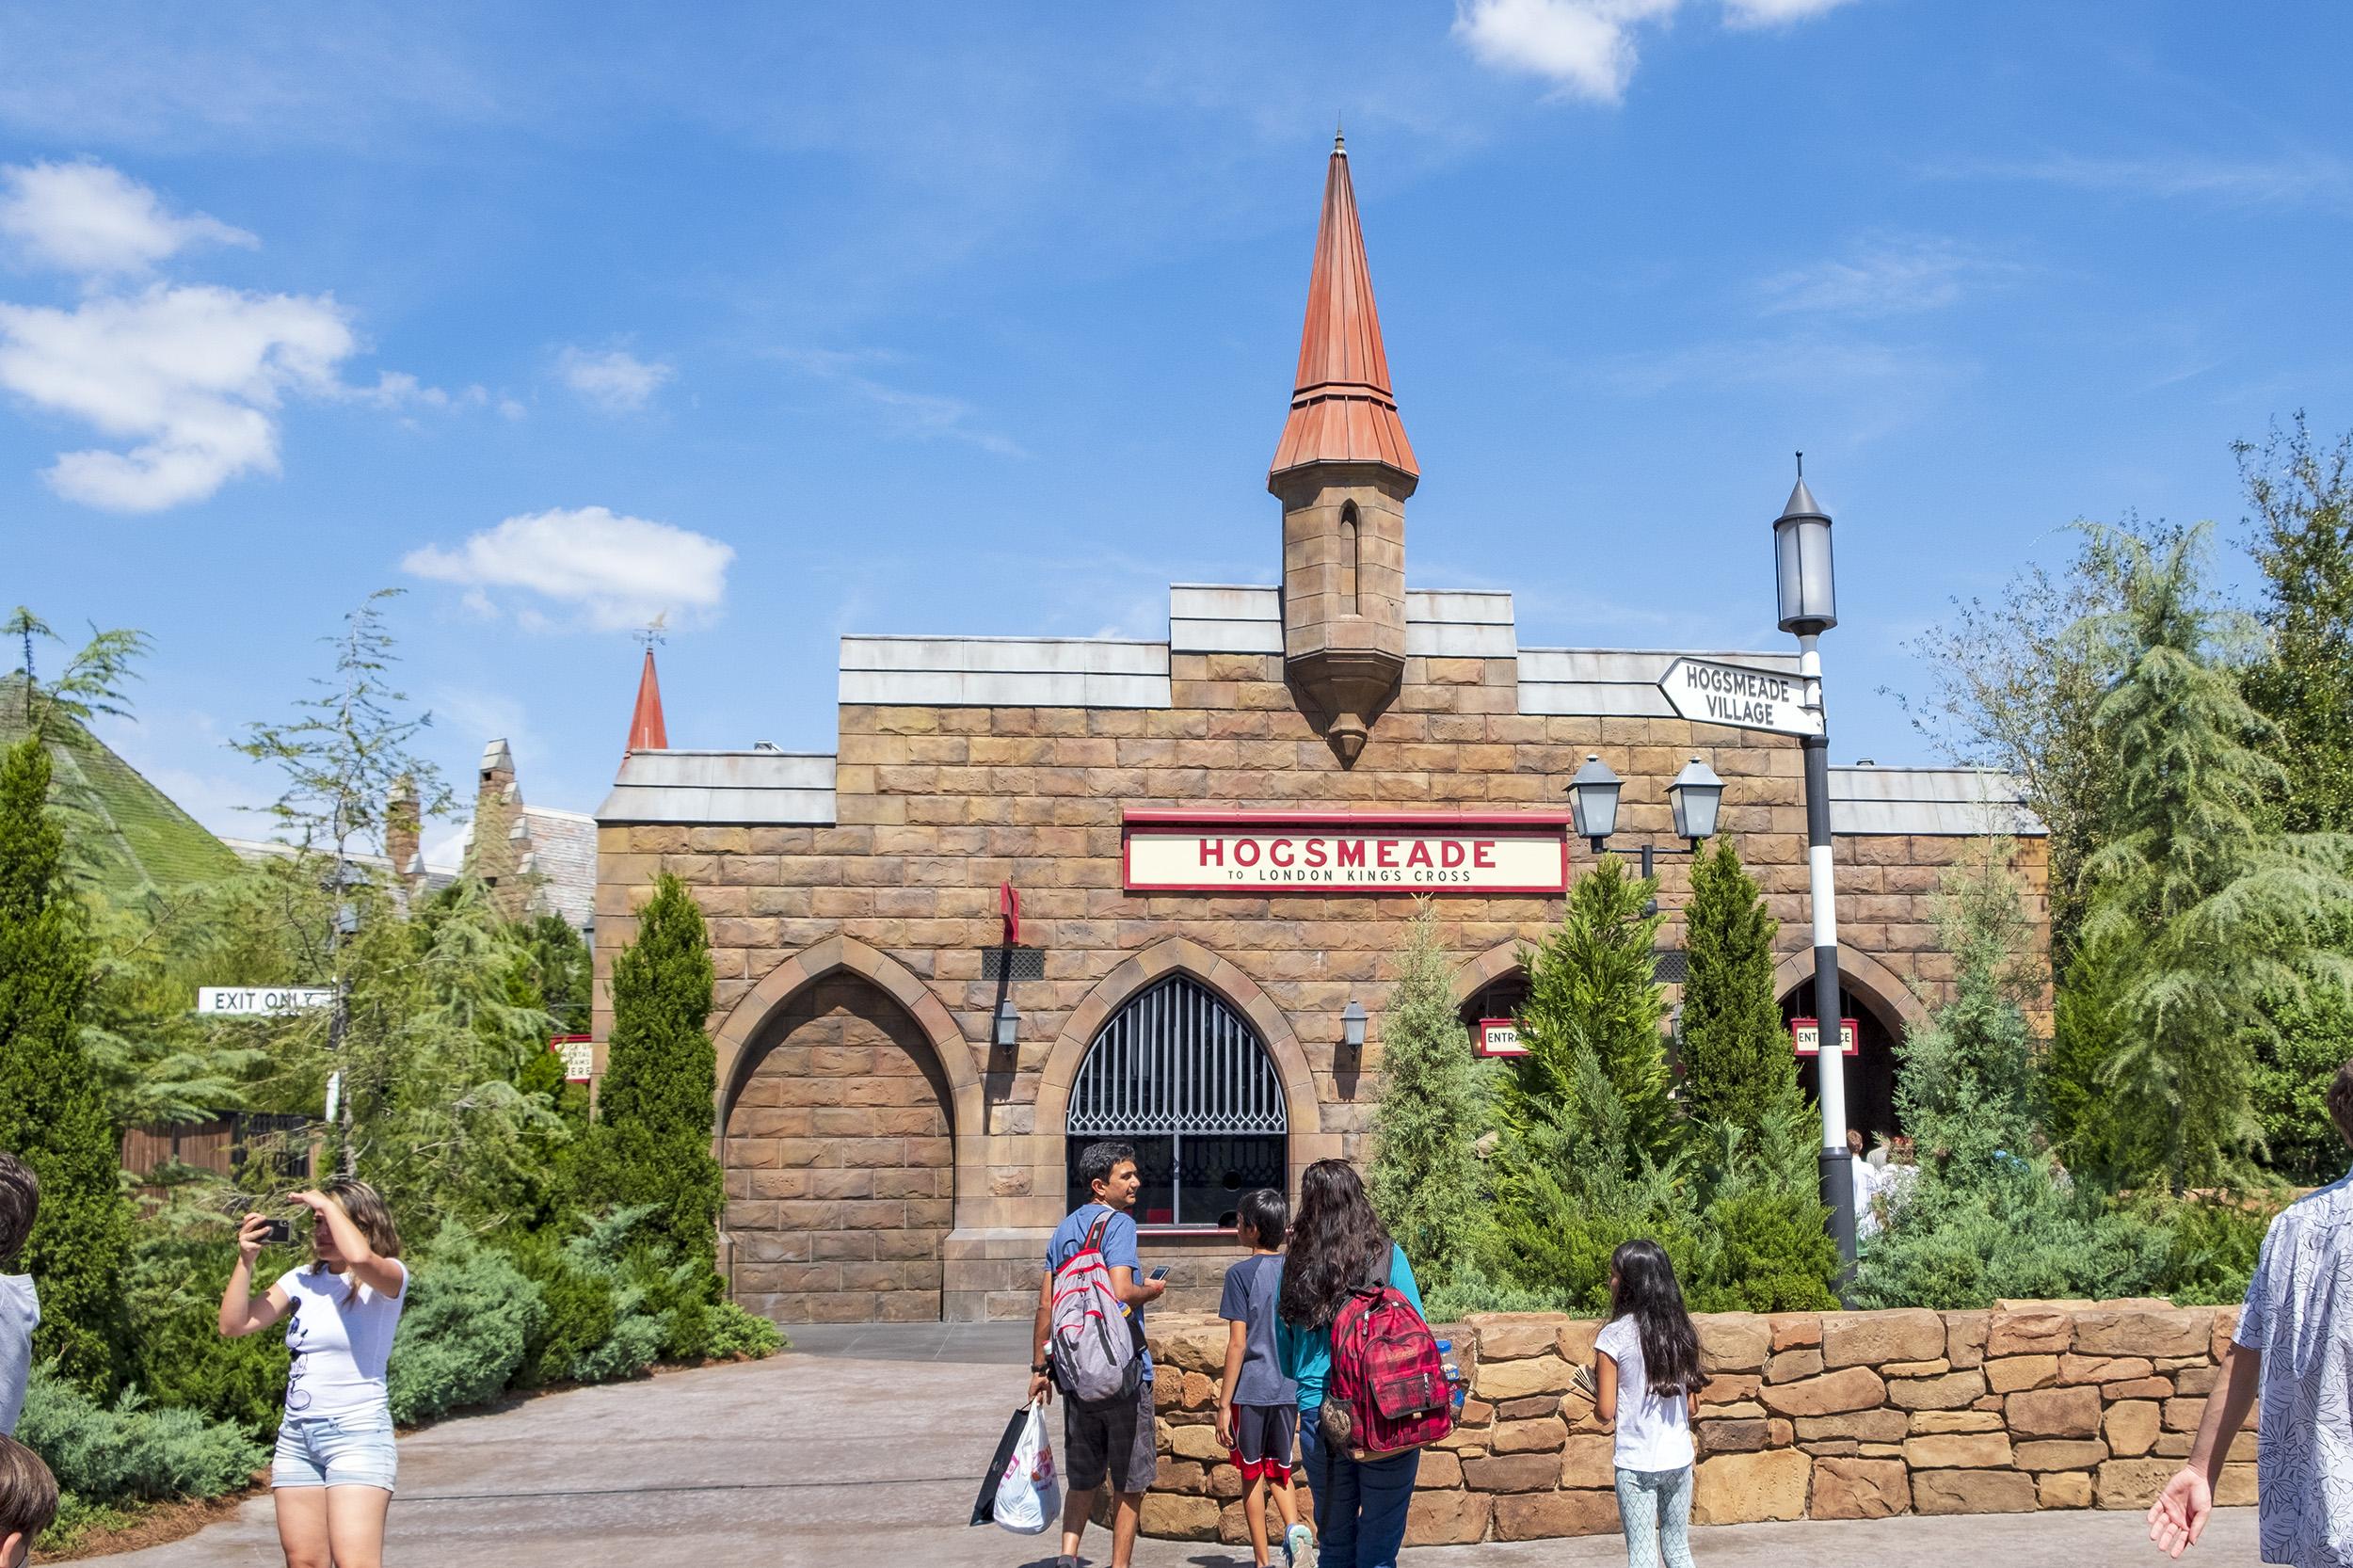 Hogsmeade Station Hogwarts The Wizarding World of Harry Potter Orlando